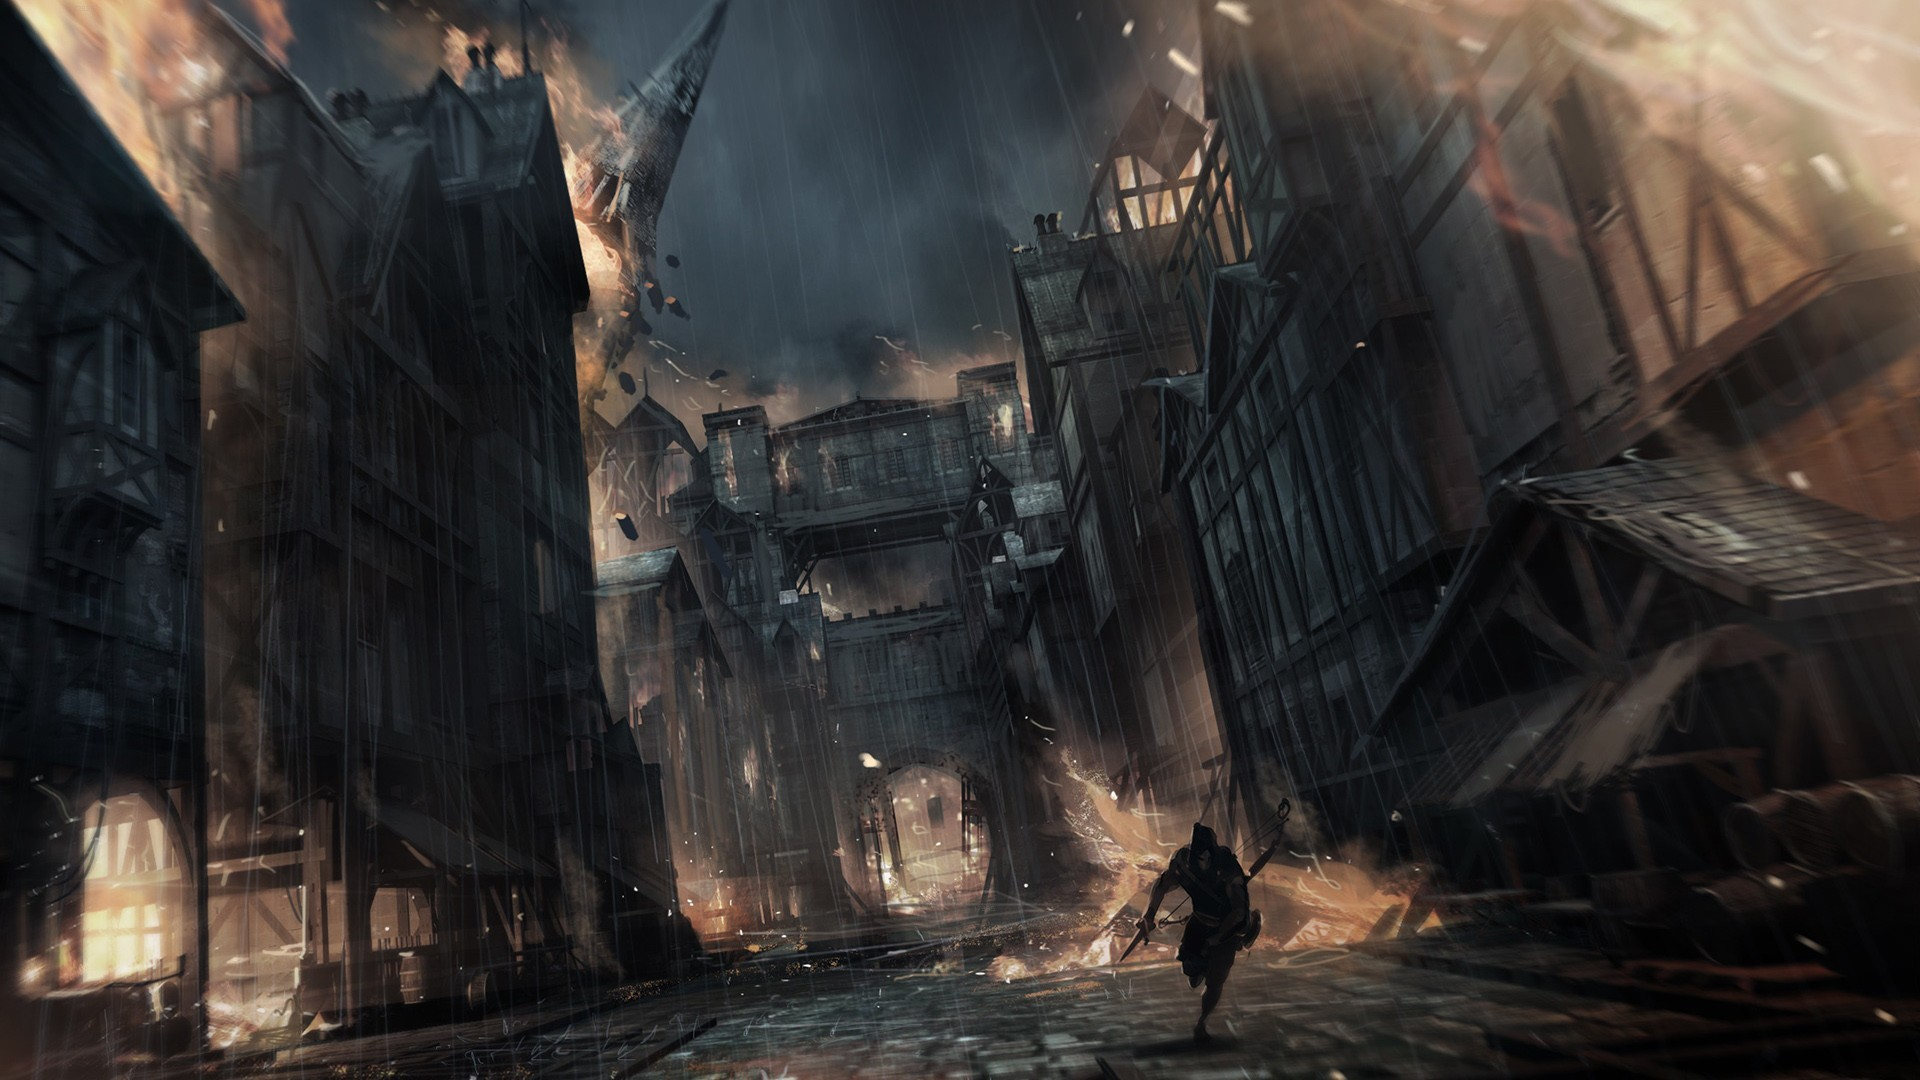 General 1920x1080 video games video game art fantasy city